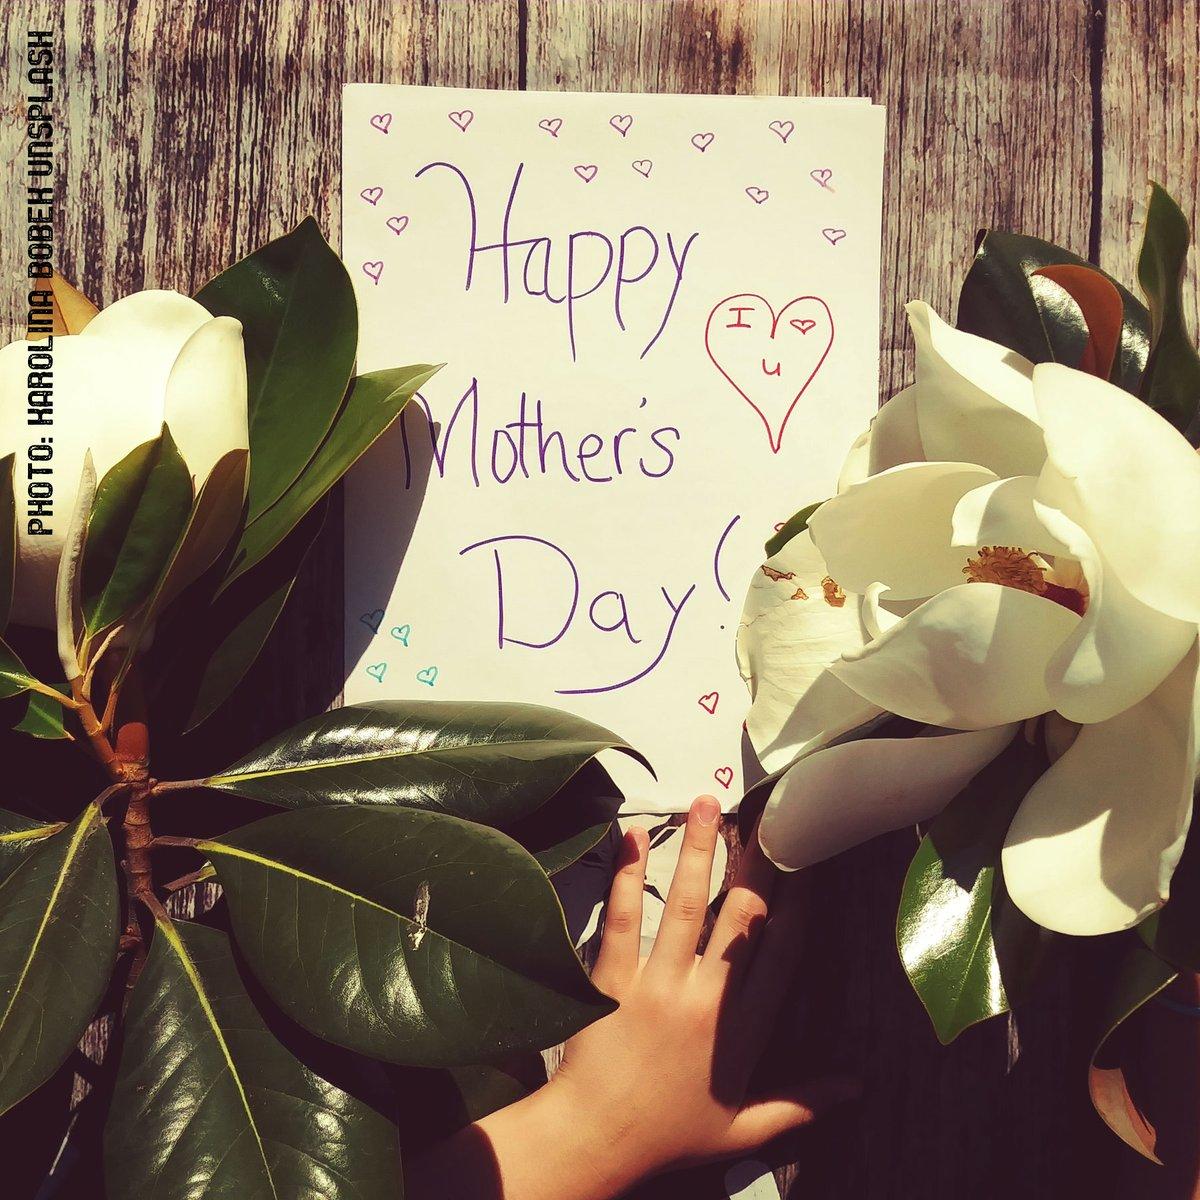 Happy Mother's Day to all the moms out there! #welovemom #happymothersday #igokailua #hawaiinokaoi https://t.co/5Erfu9piNZ